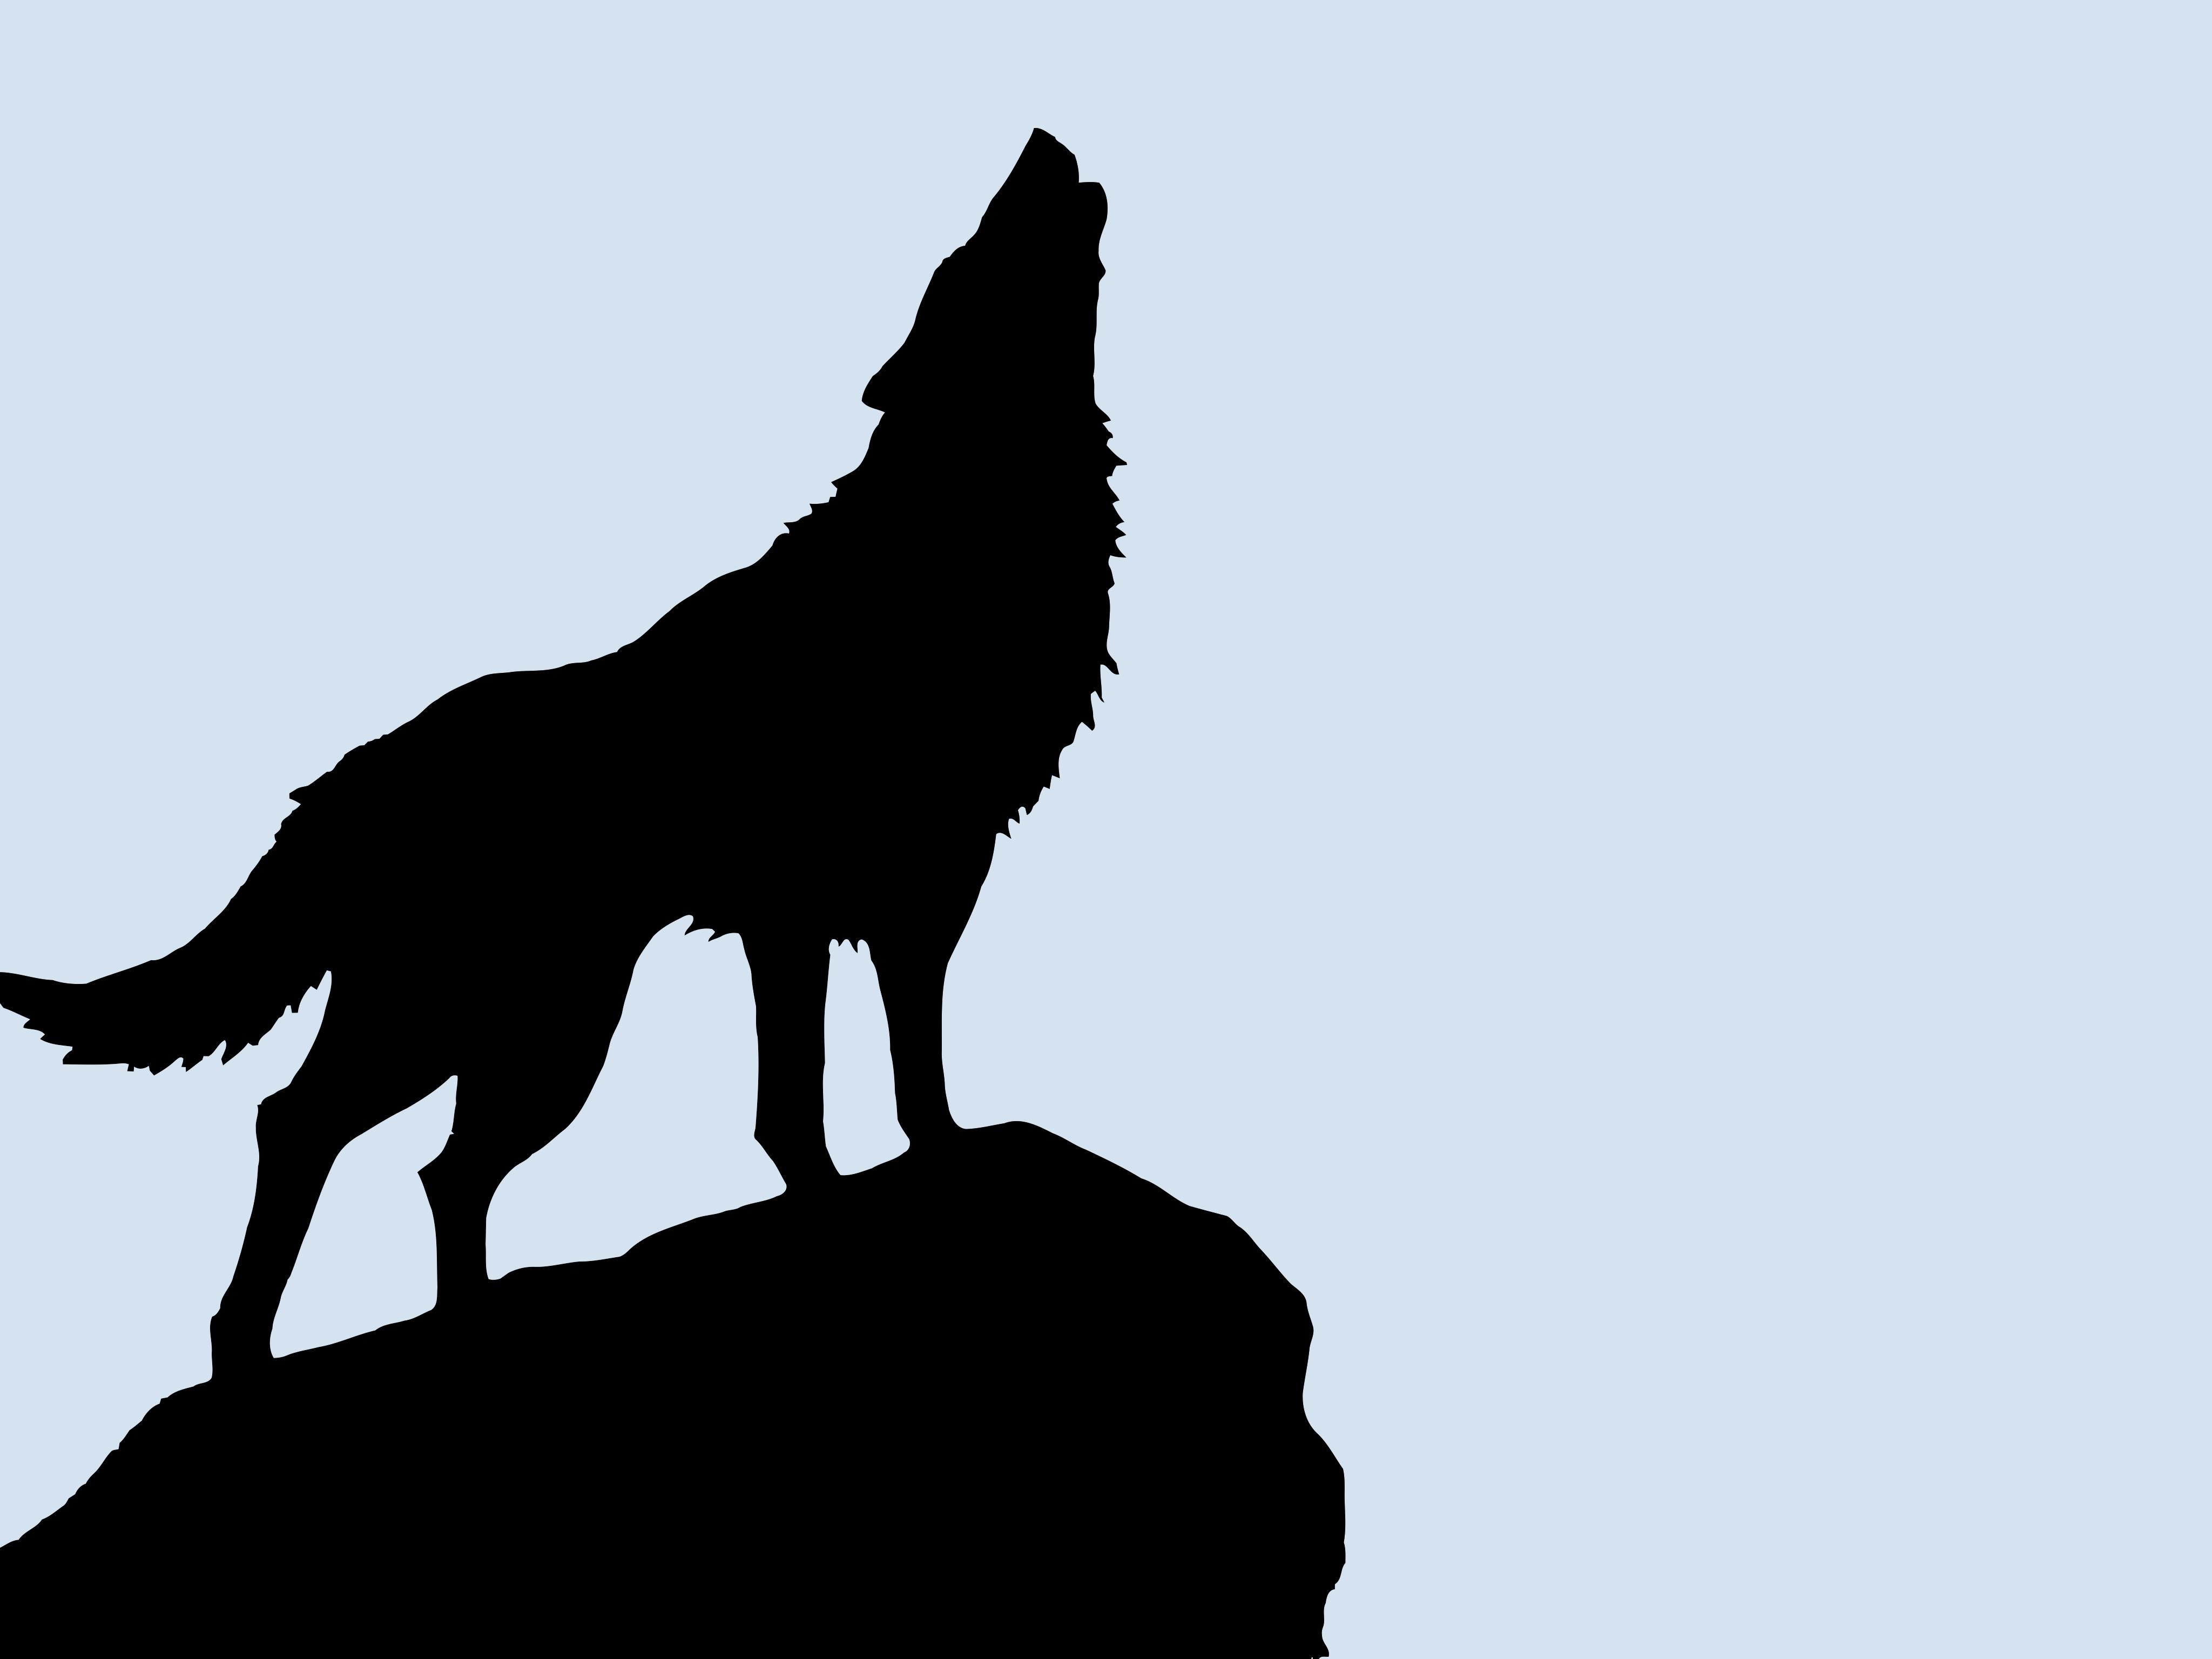 4096x3072 Animal Silhouette Black Wolf Sideways Jpg 8xnlpn Clipart